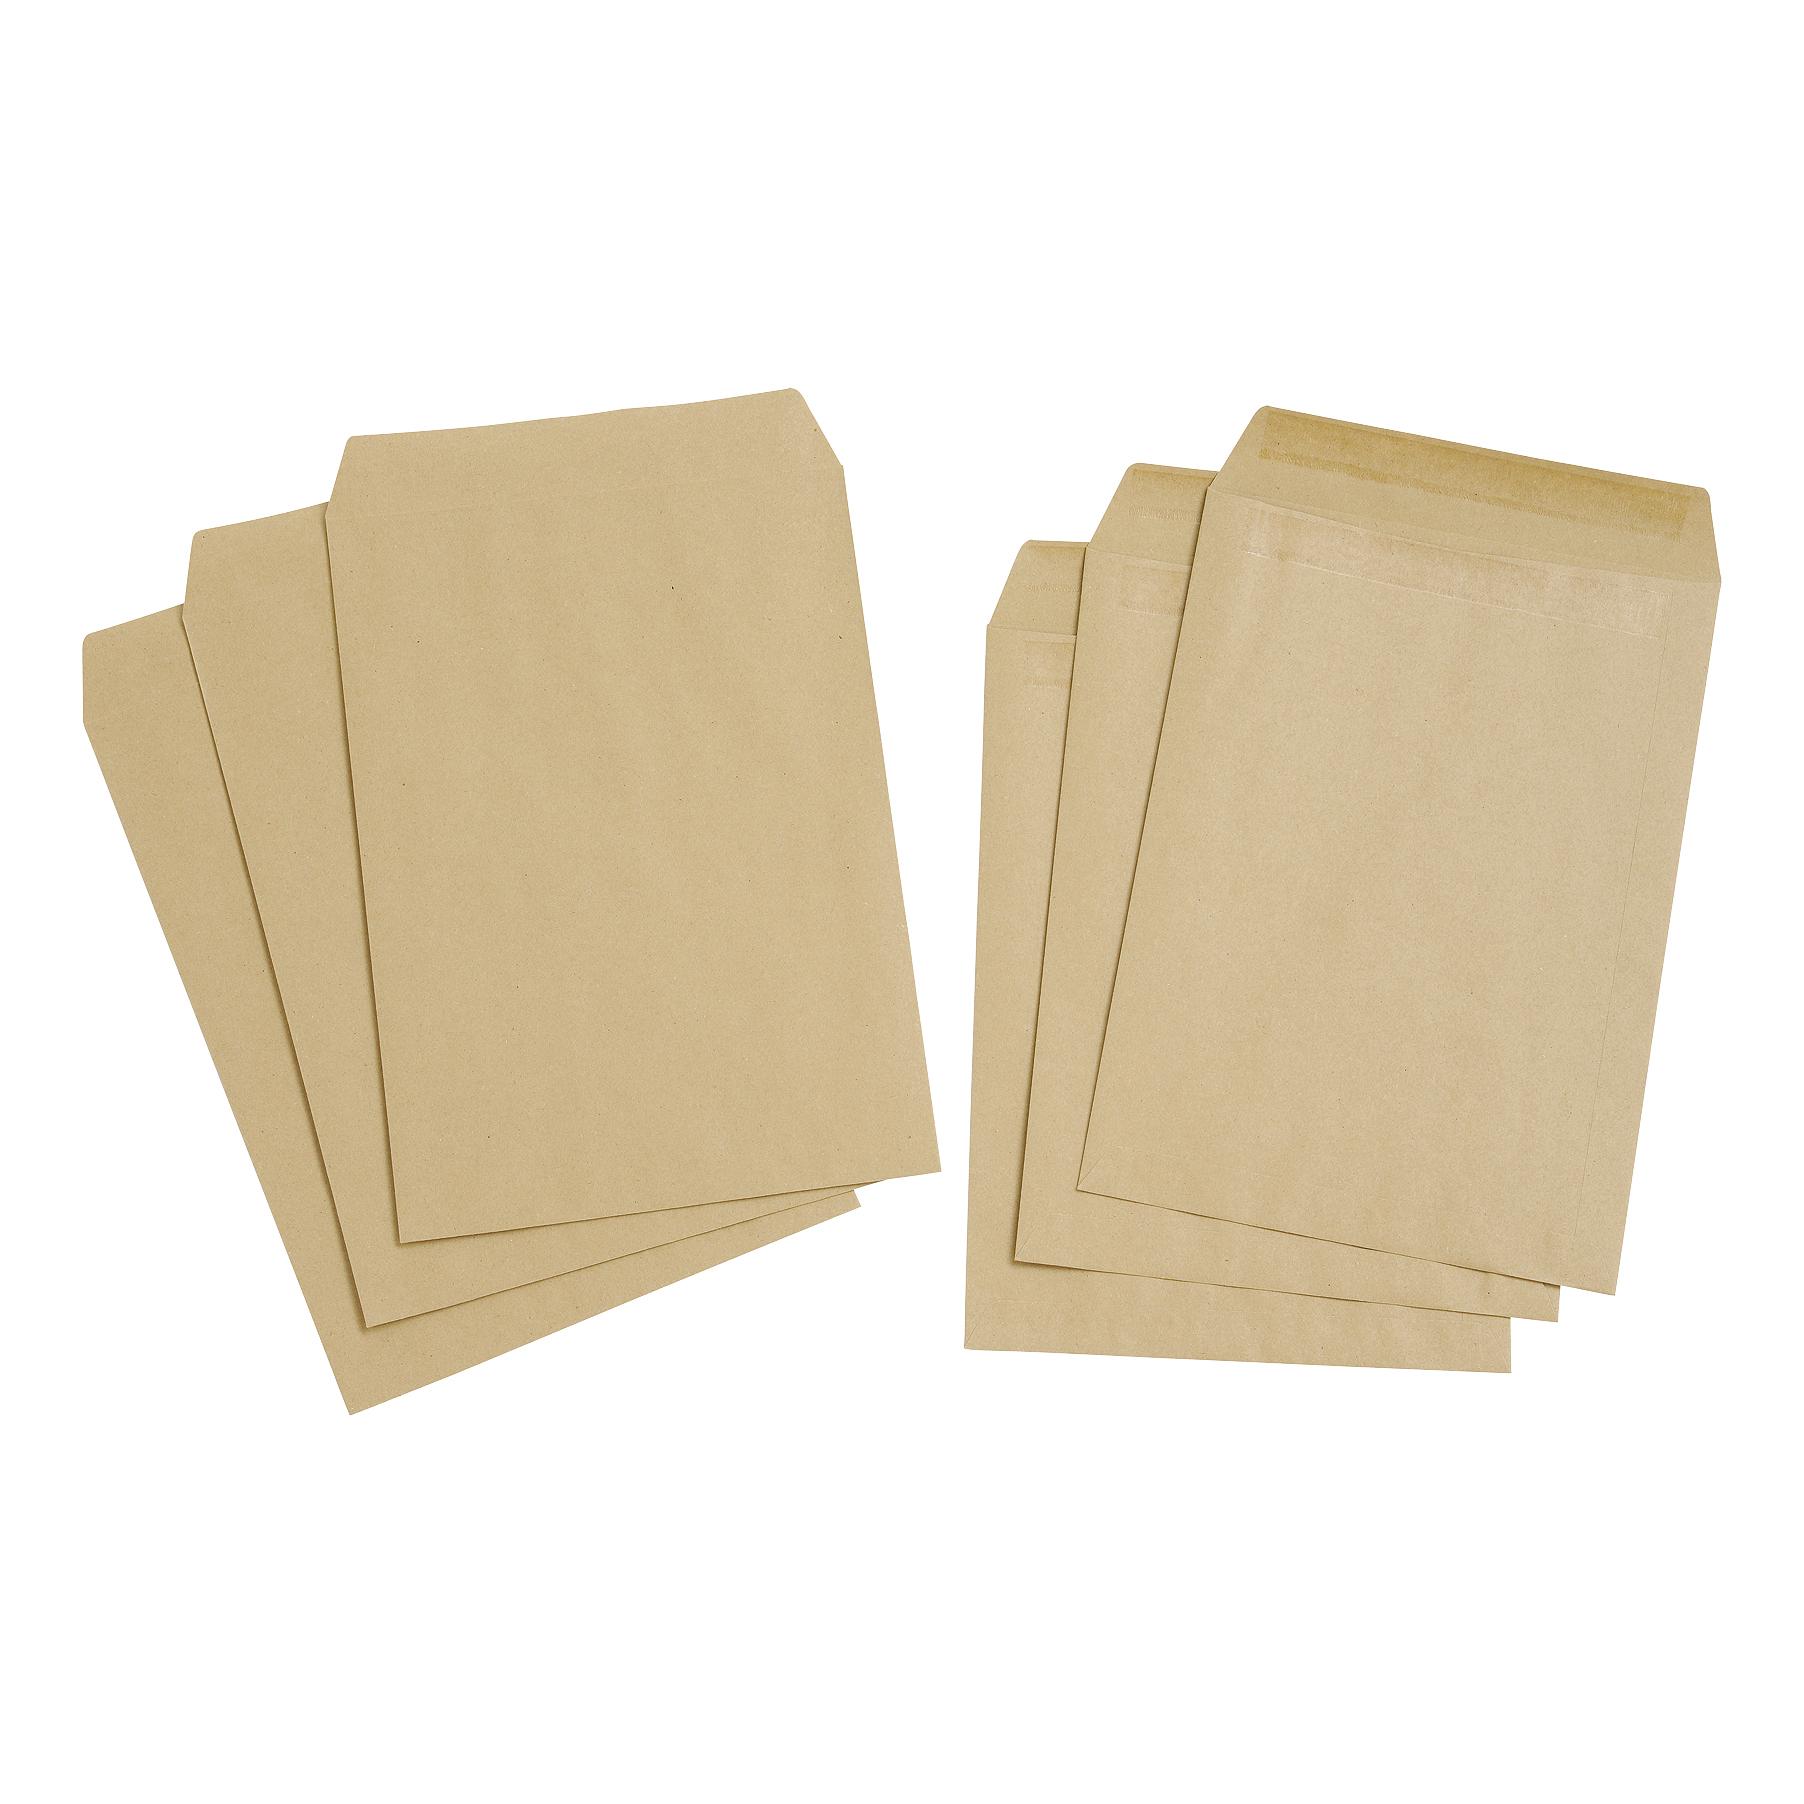 Uno Envelope C4 Buff Manilla P5 Pocket Nwd Plain Box 250